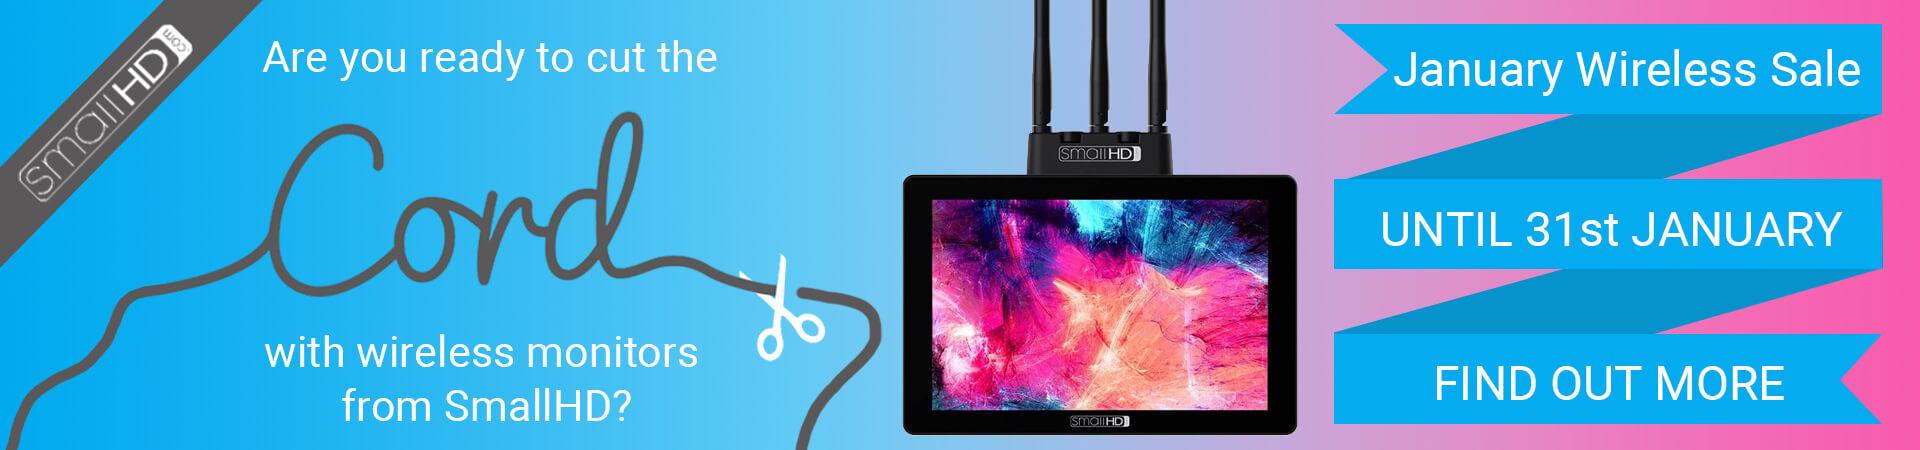 SmallHD January Wireless Sale